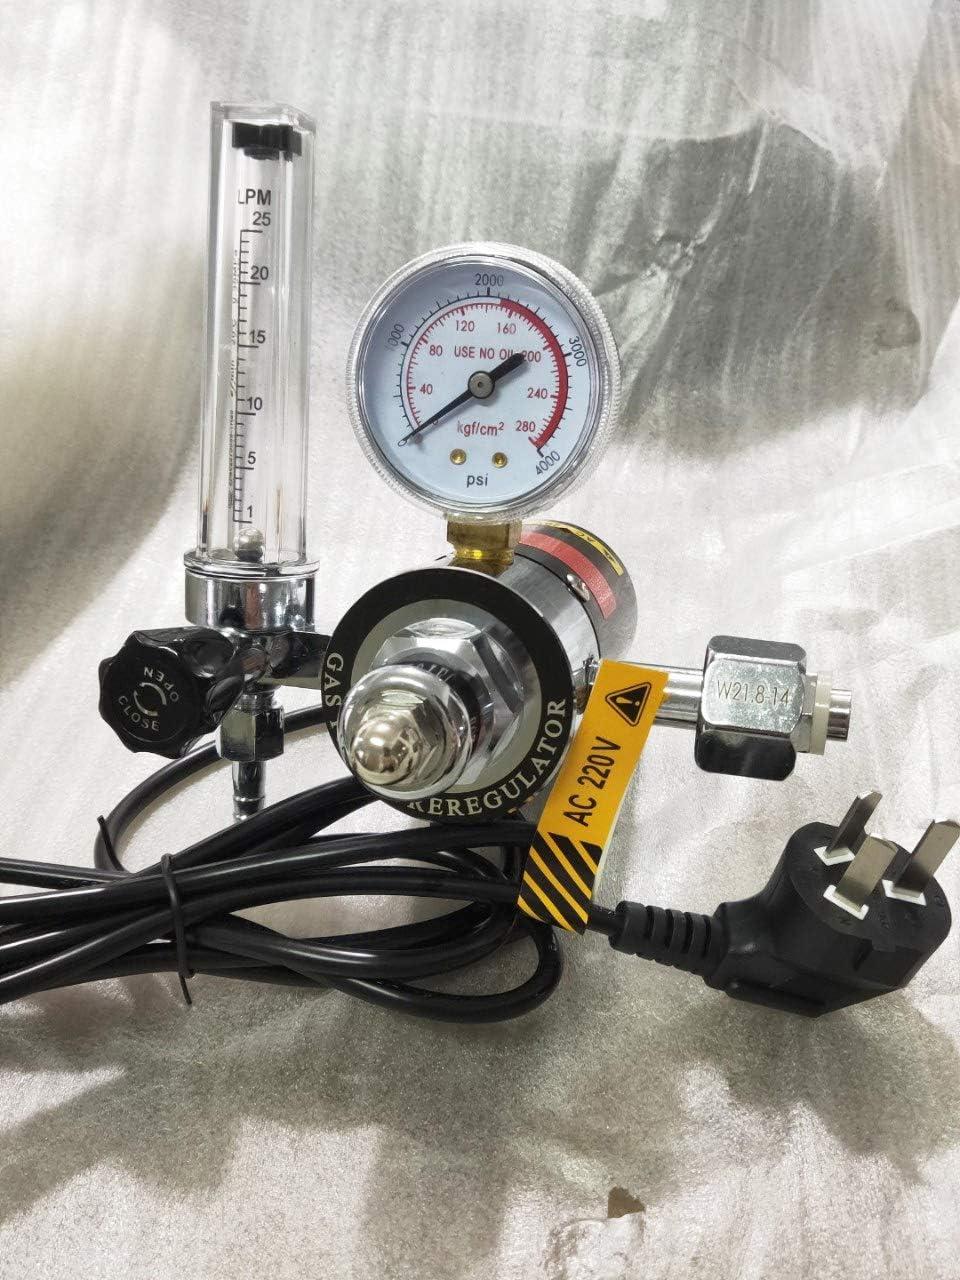 Heated CO2 Pressure Reducer CGA540 Pressure Gauge Inlet G5//8-14 Outlet M12 AC36V Hanchen Gas CO2 Regulator